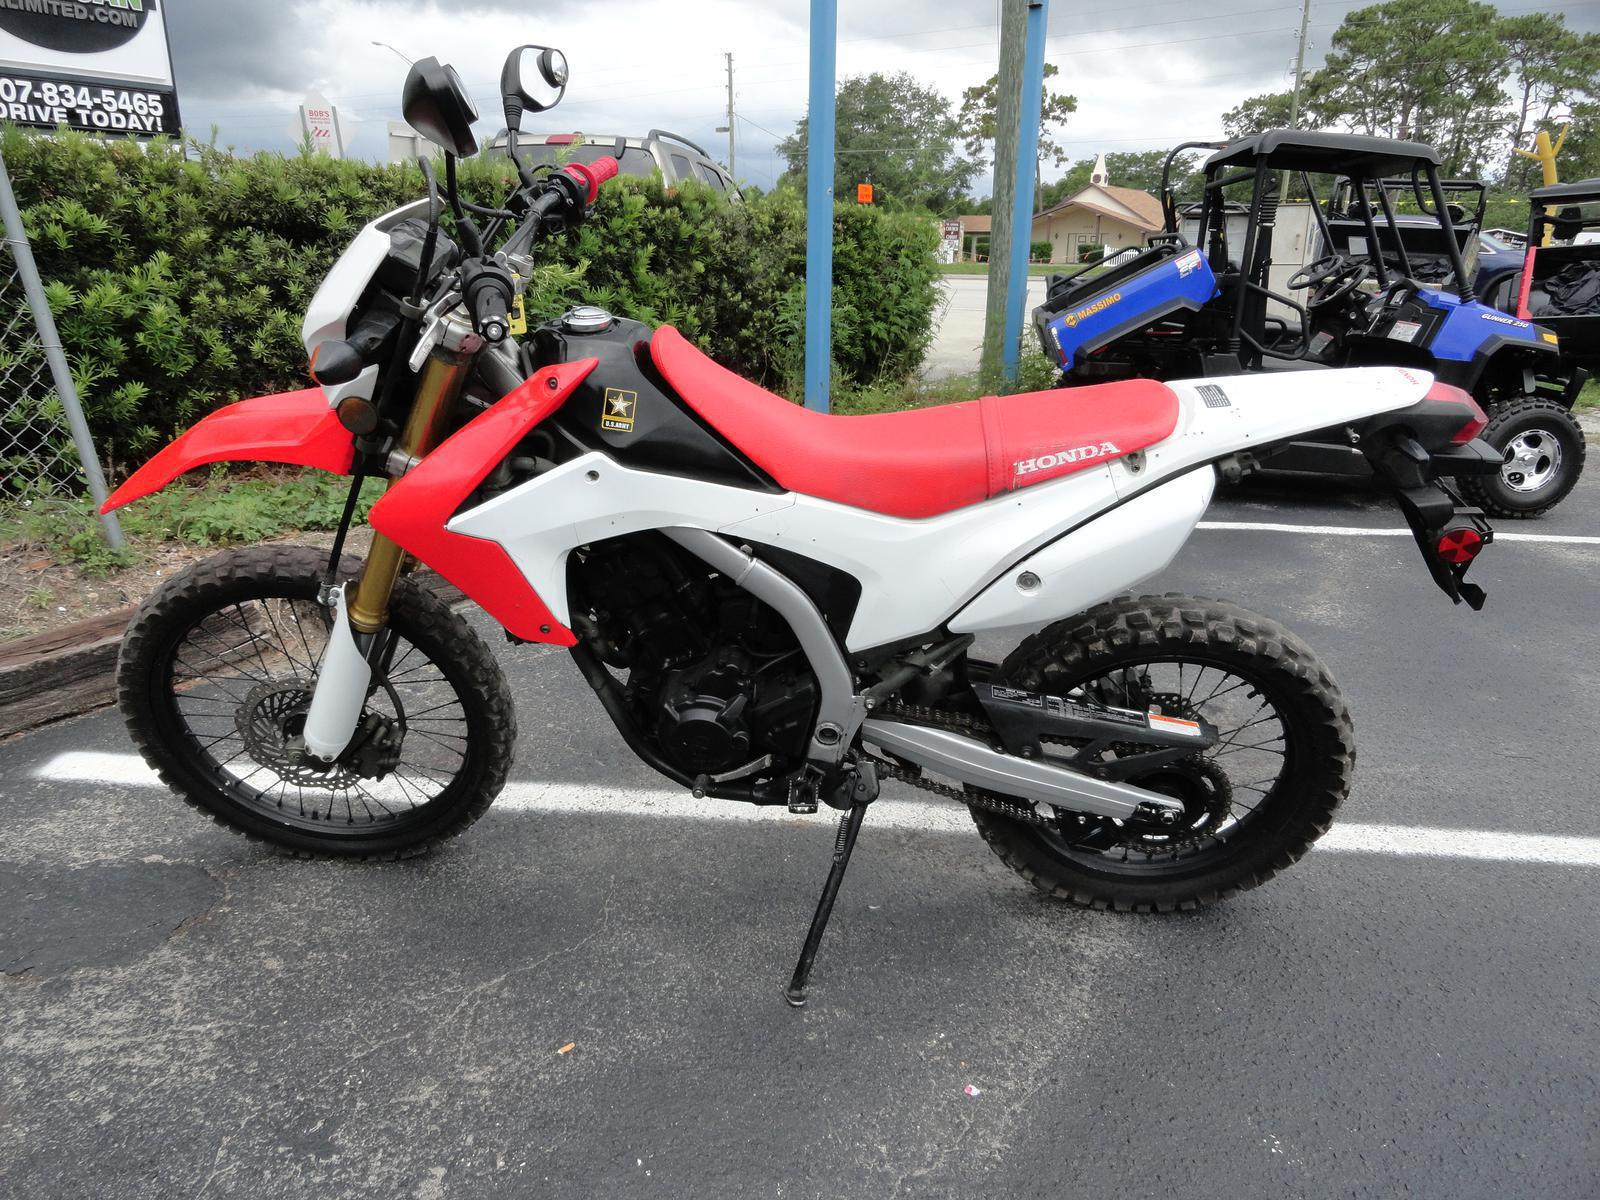 2015 Honda CRF250L for sale in Longwood FL